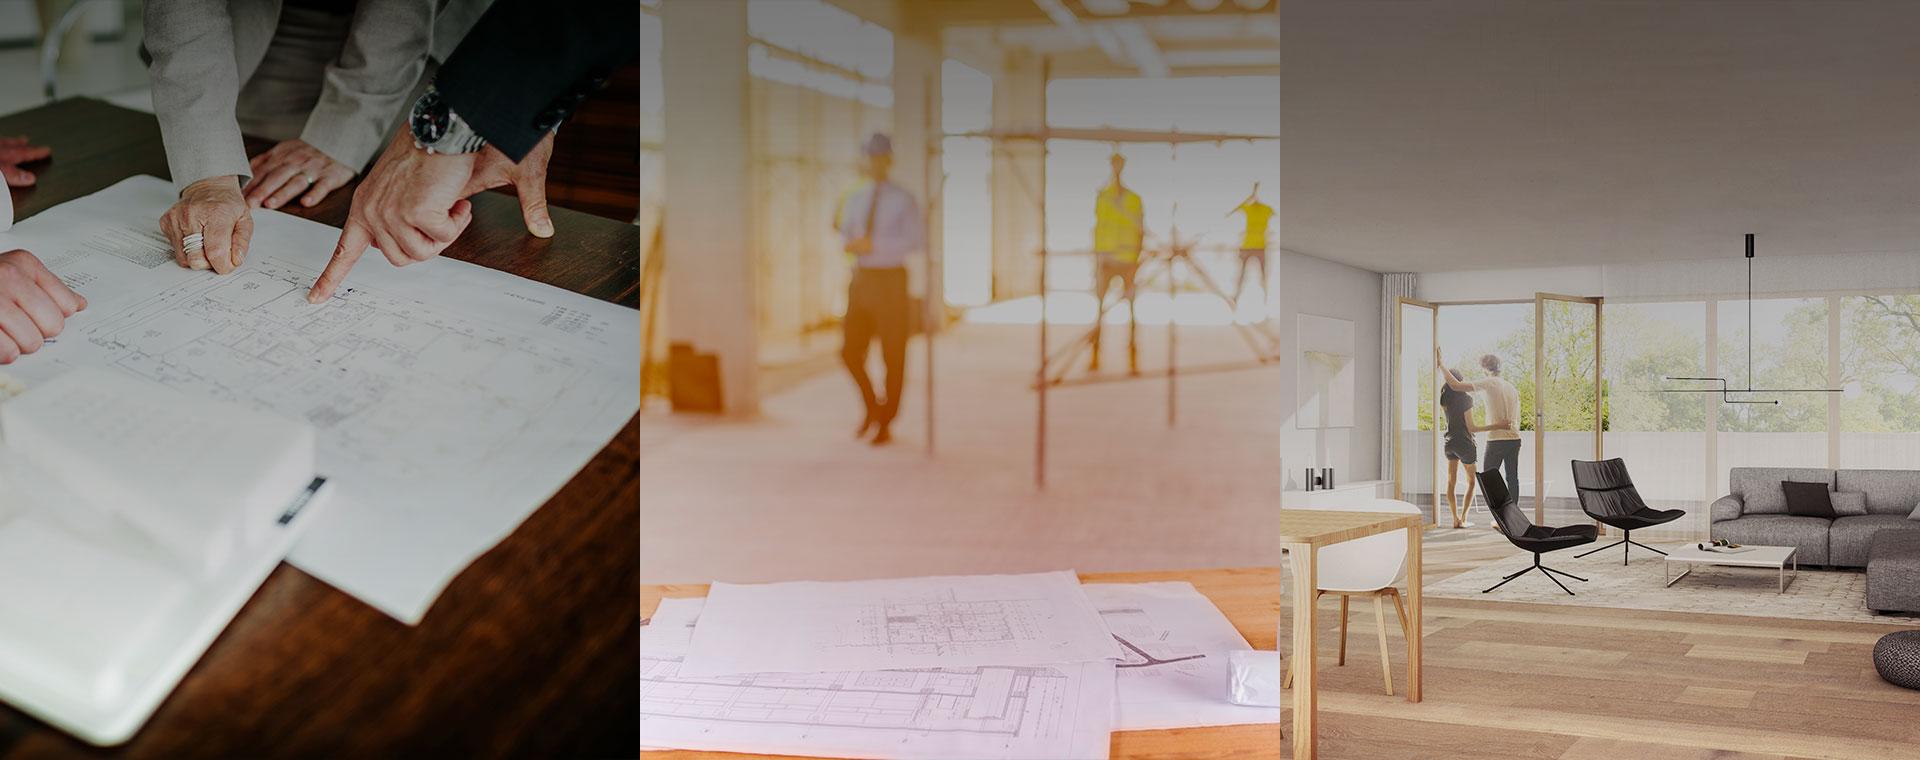 Aktuelle Immobilienprojekte | BAUWERKE – Liebe & Partner